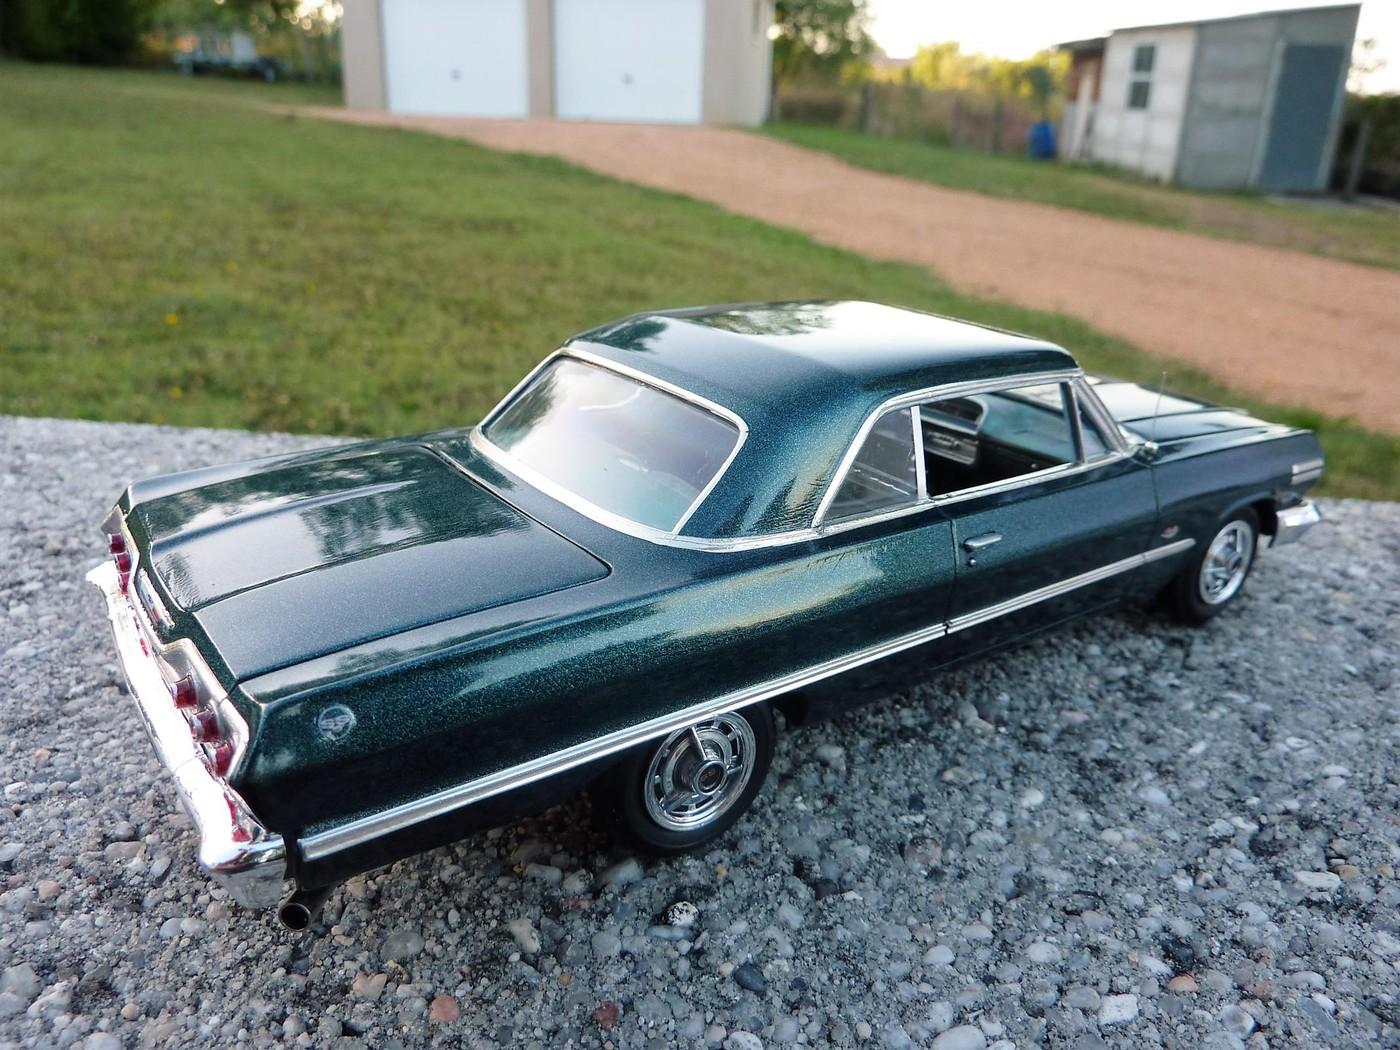 Chevrolet Impala 63 terminée - Page 2 Photo23-vi